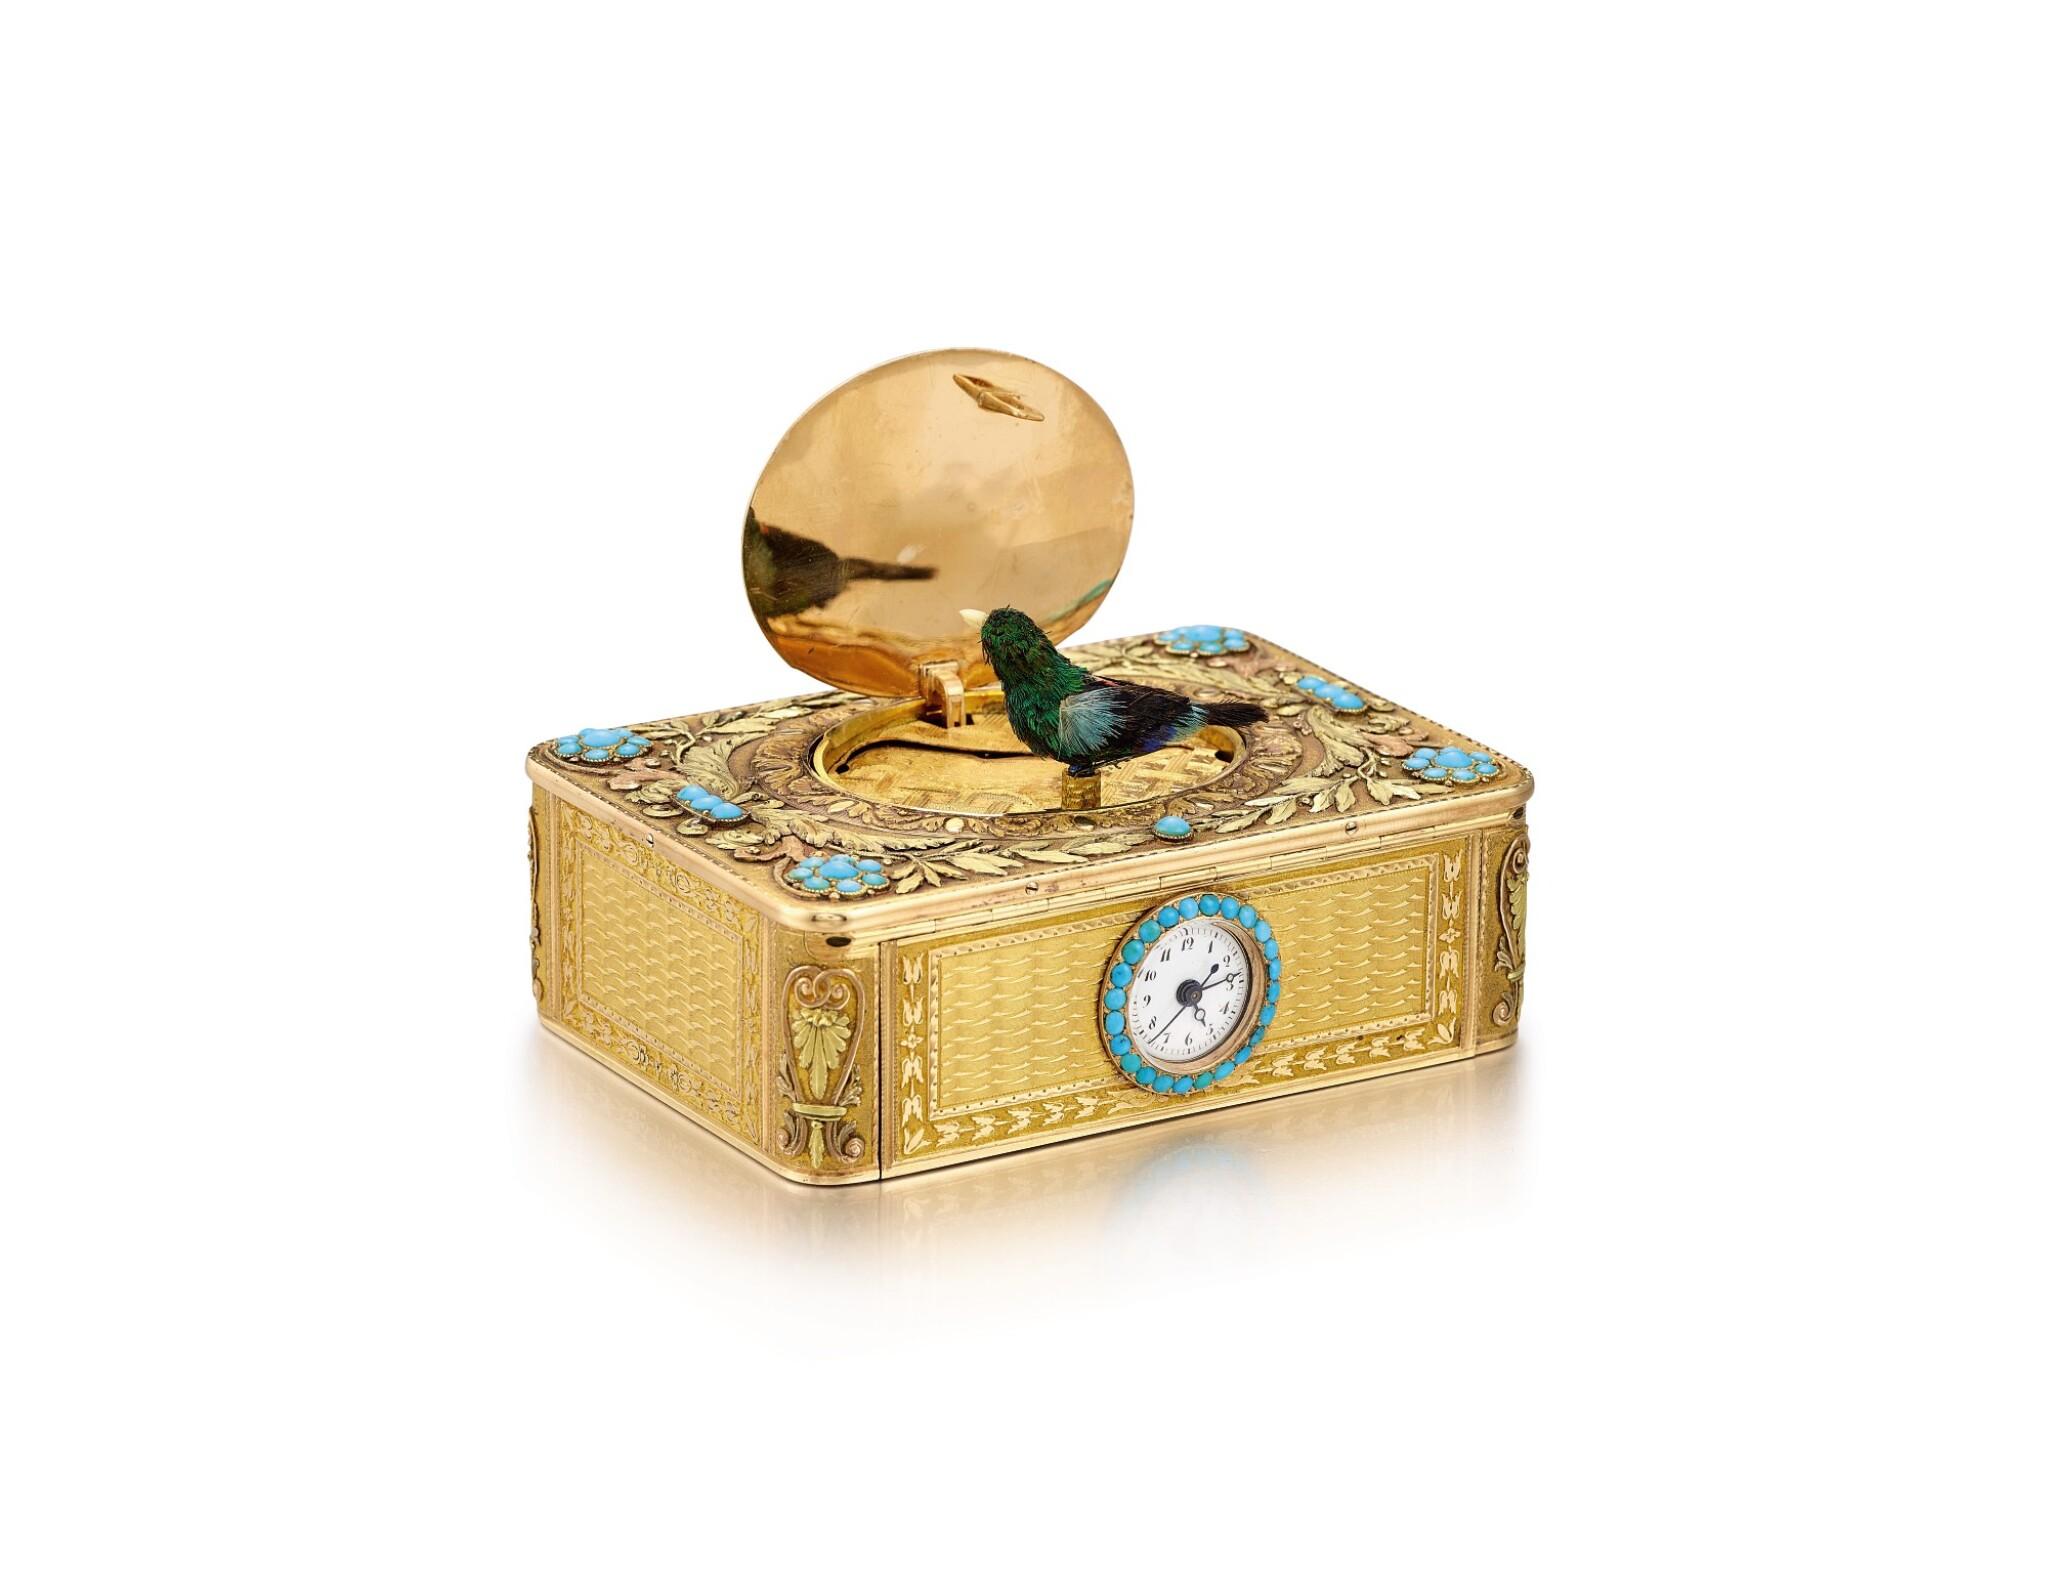 "View full screen - View 1 of Lot 2092. LES FRÈRES ROCHAT   NO 181, A VARI-COLOUR GOLD AND TURQUOISE SINGING BIRD BOX WITH QUARTER REPEATING WATCH, CIRCA 1820   ""NO181 多色黃金鑲綠松石鳥鳴盒子,備大三針及二問鐘錶,約1820年製""."